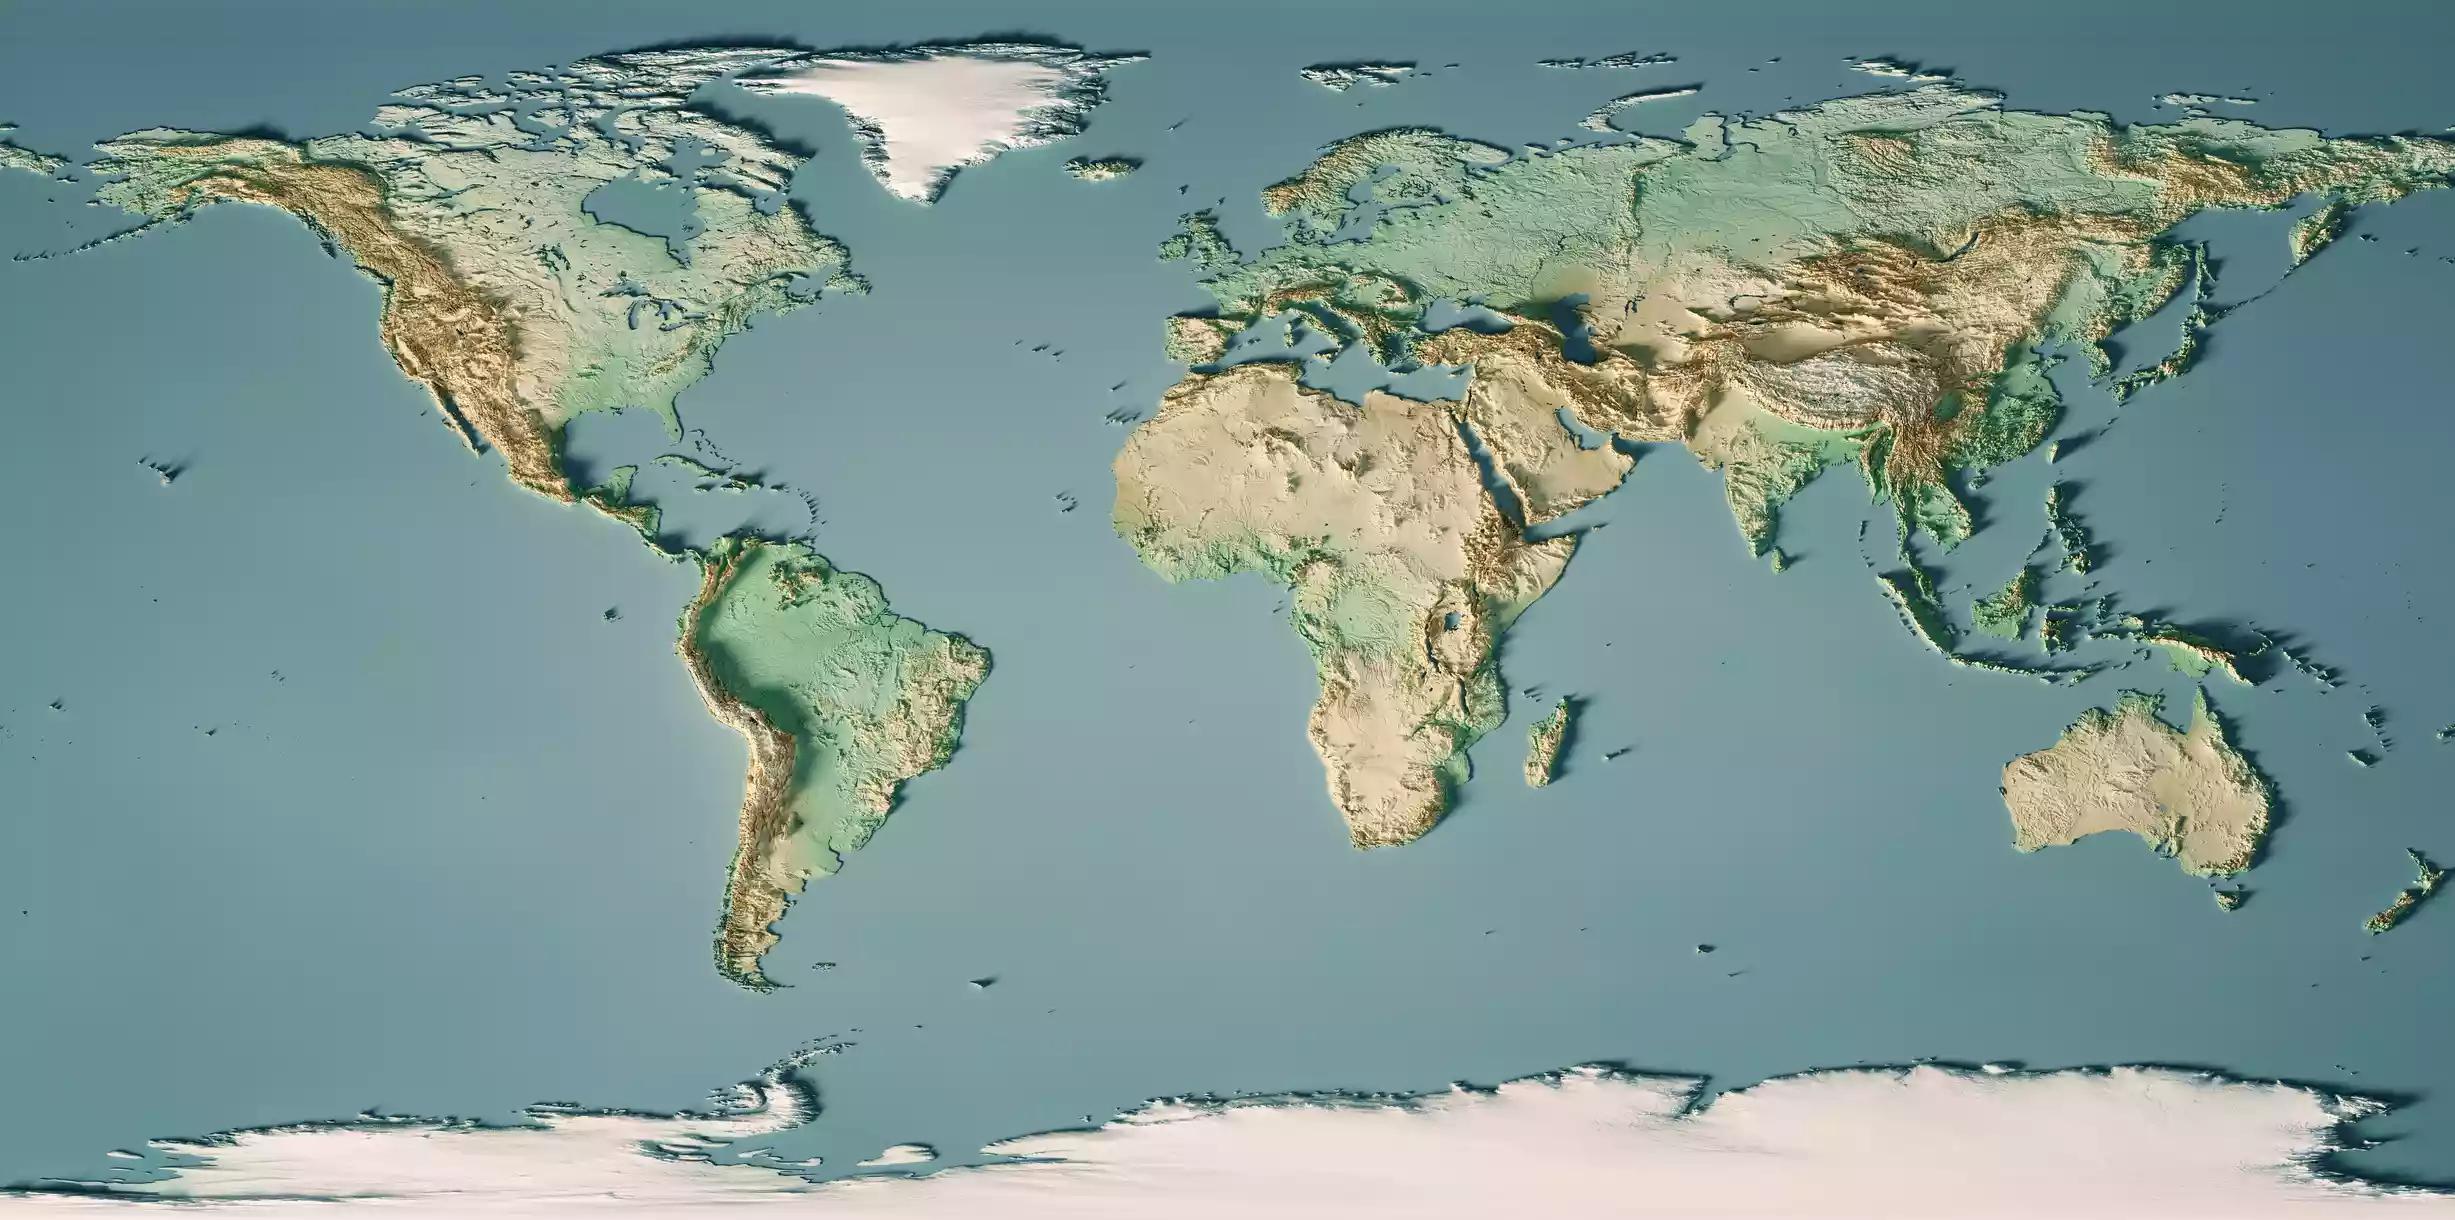 Topographic World Map 3d Model Uk